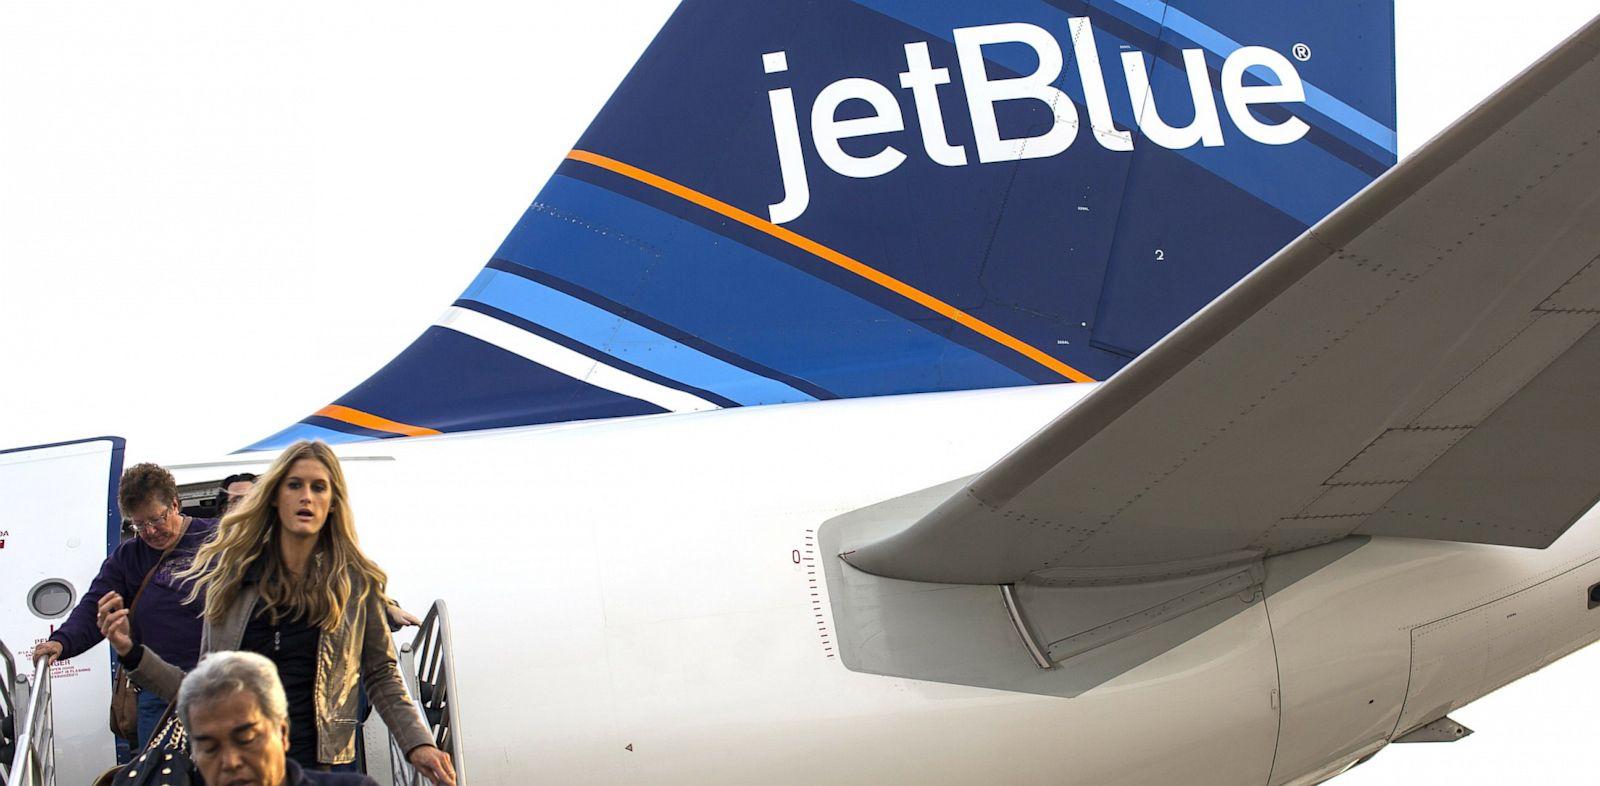 PHOTO: Passengers on a Jet Blue Airways flight